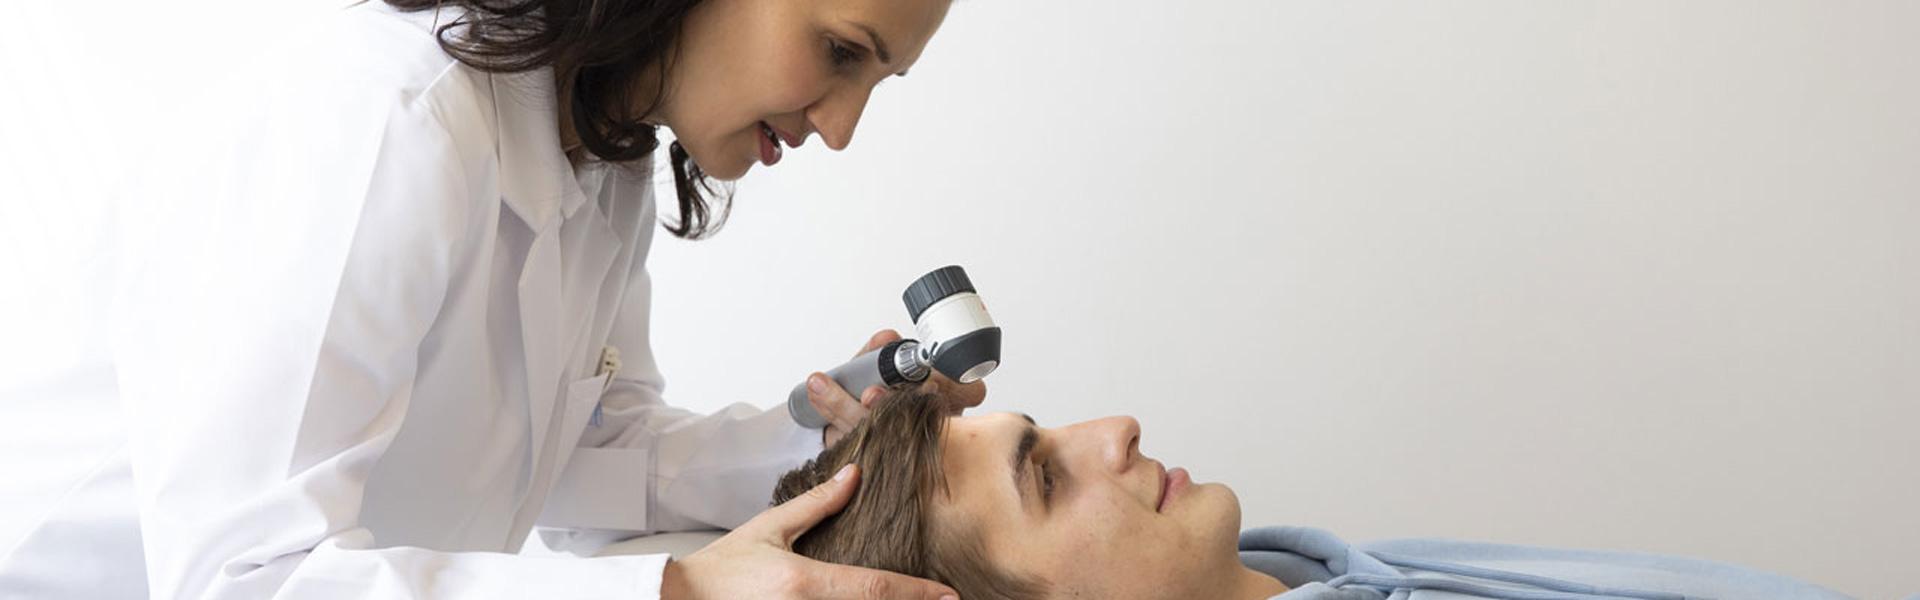 Dermatologinja z dermatoskopom pregleduje pacienta